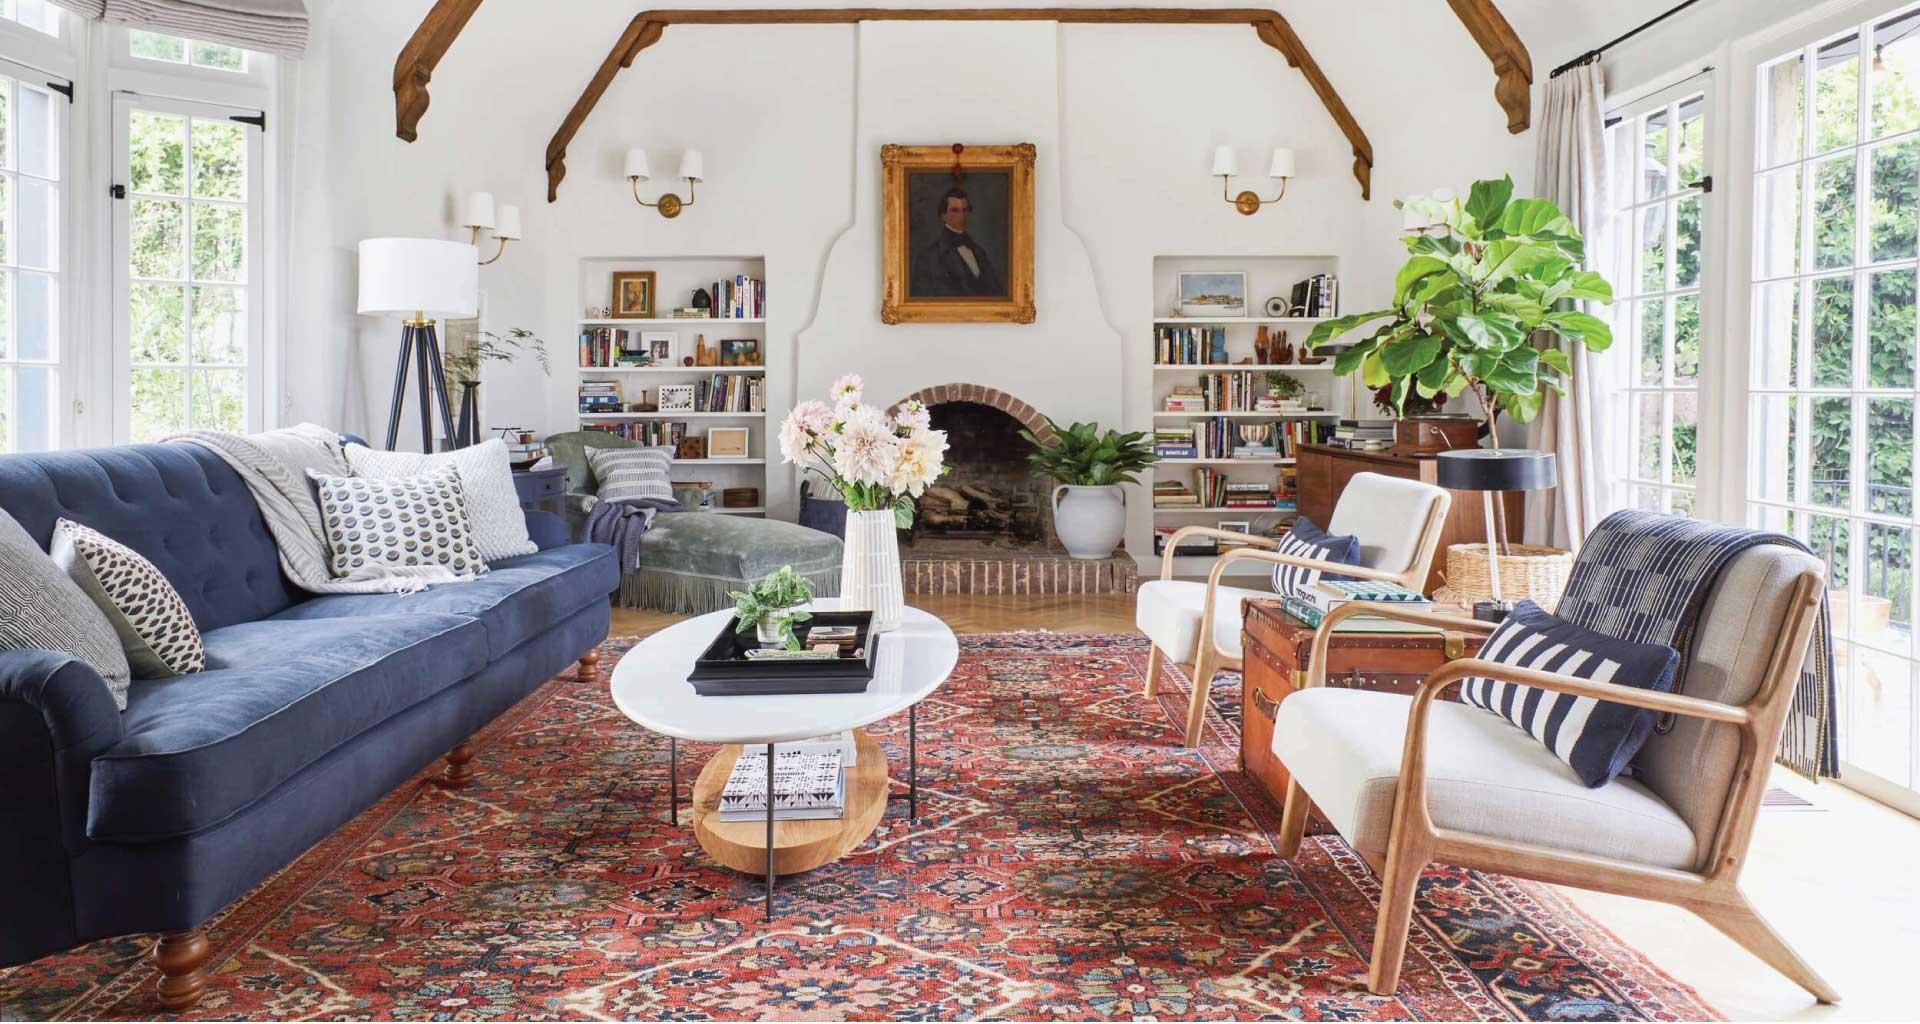 Living Room Decorating Ideas 10 Fresh Tips With Photos Lazy Loft